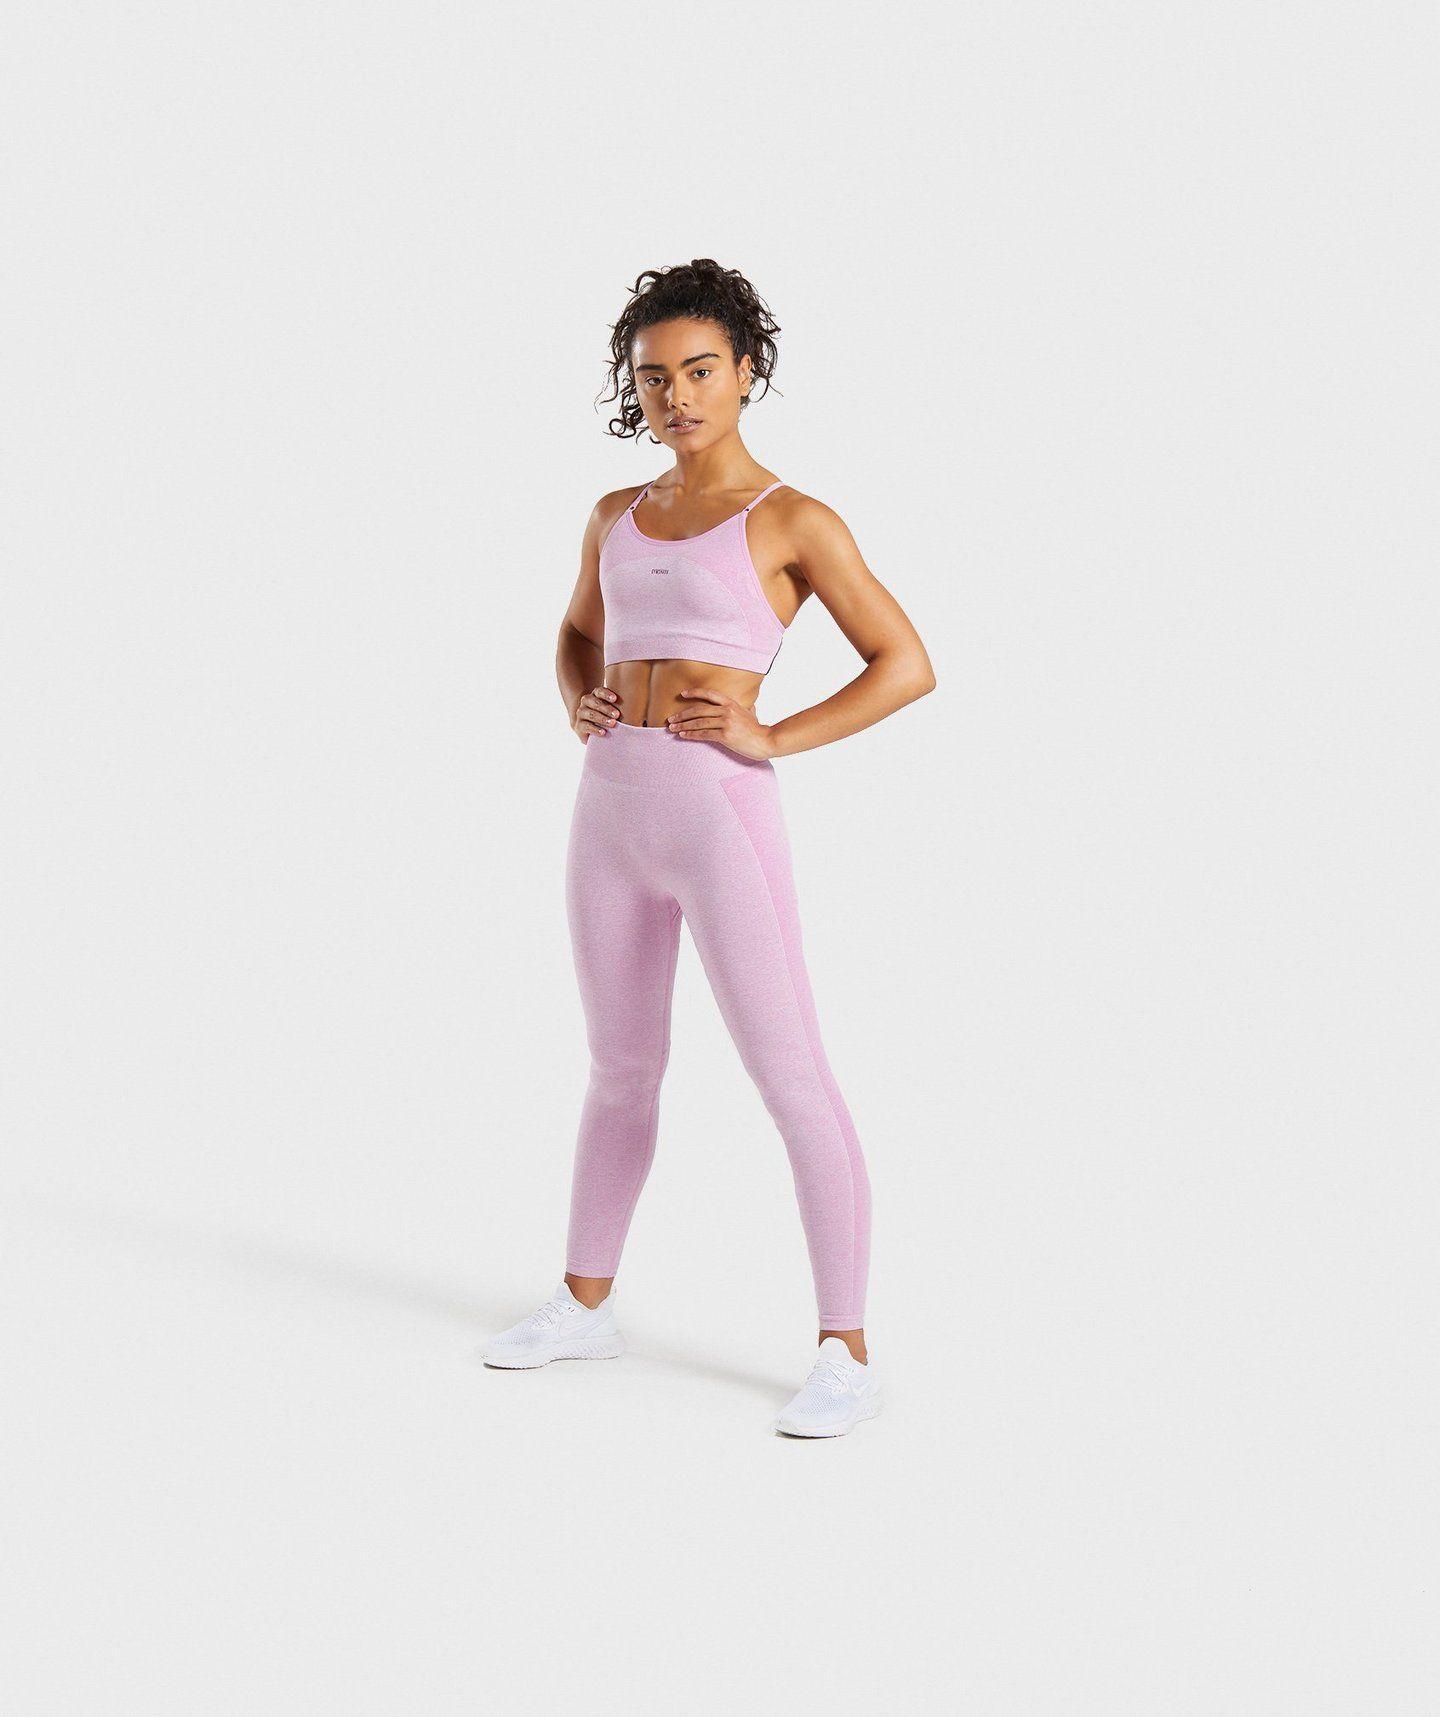 Gymshark Flex Strappy Sports Bra Pink Pink sports bra